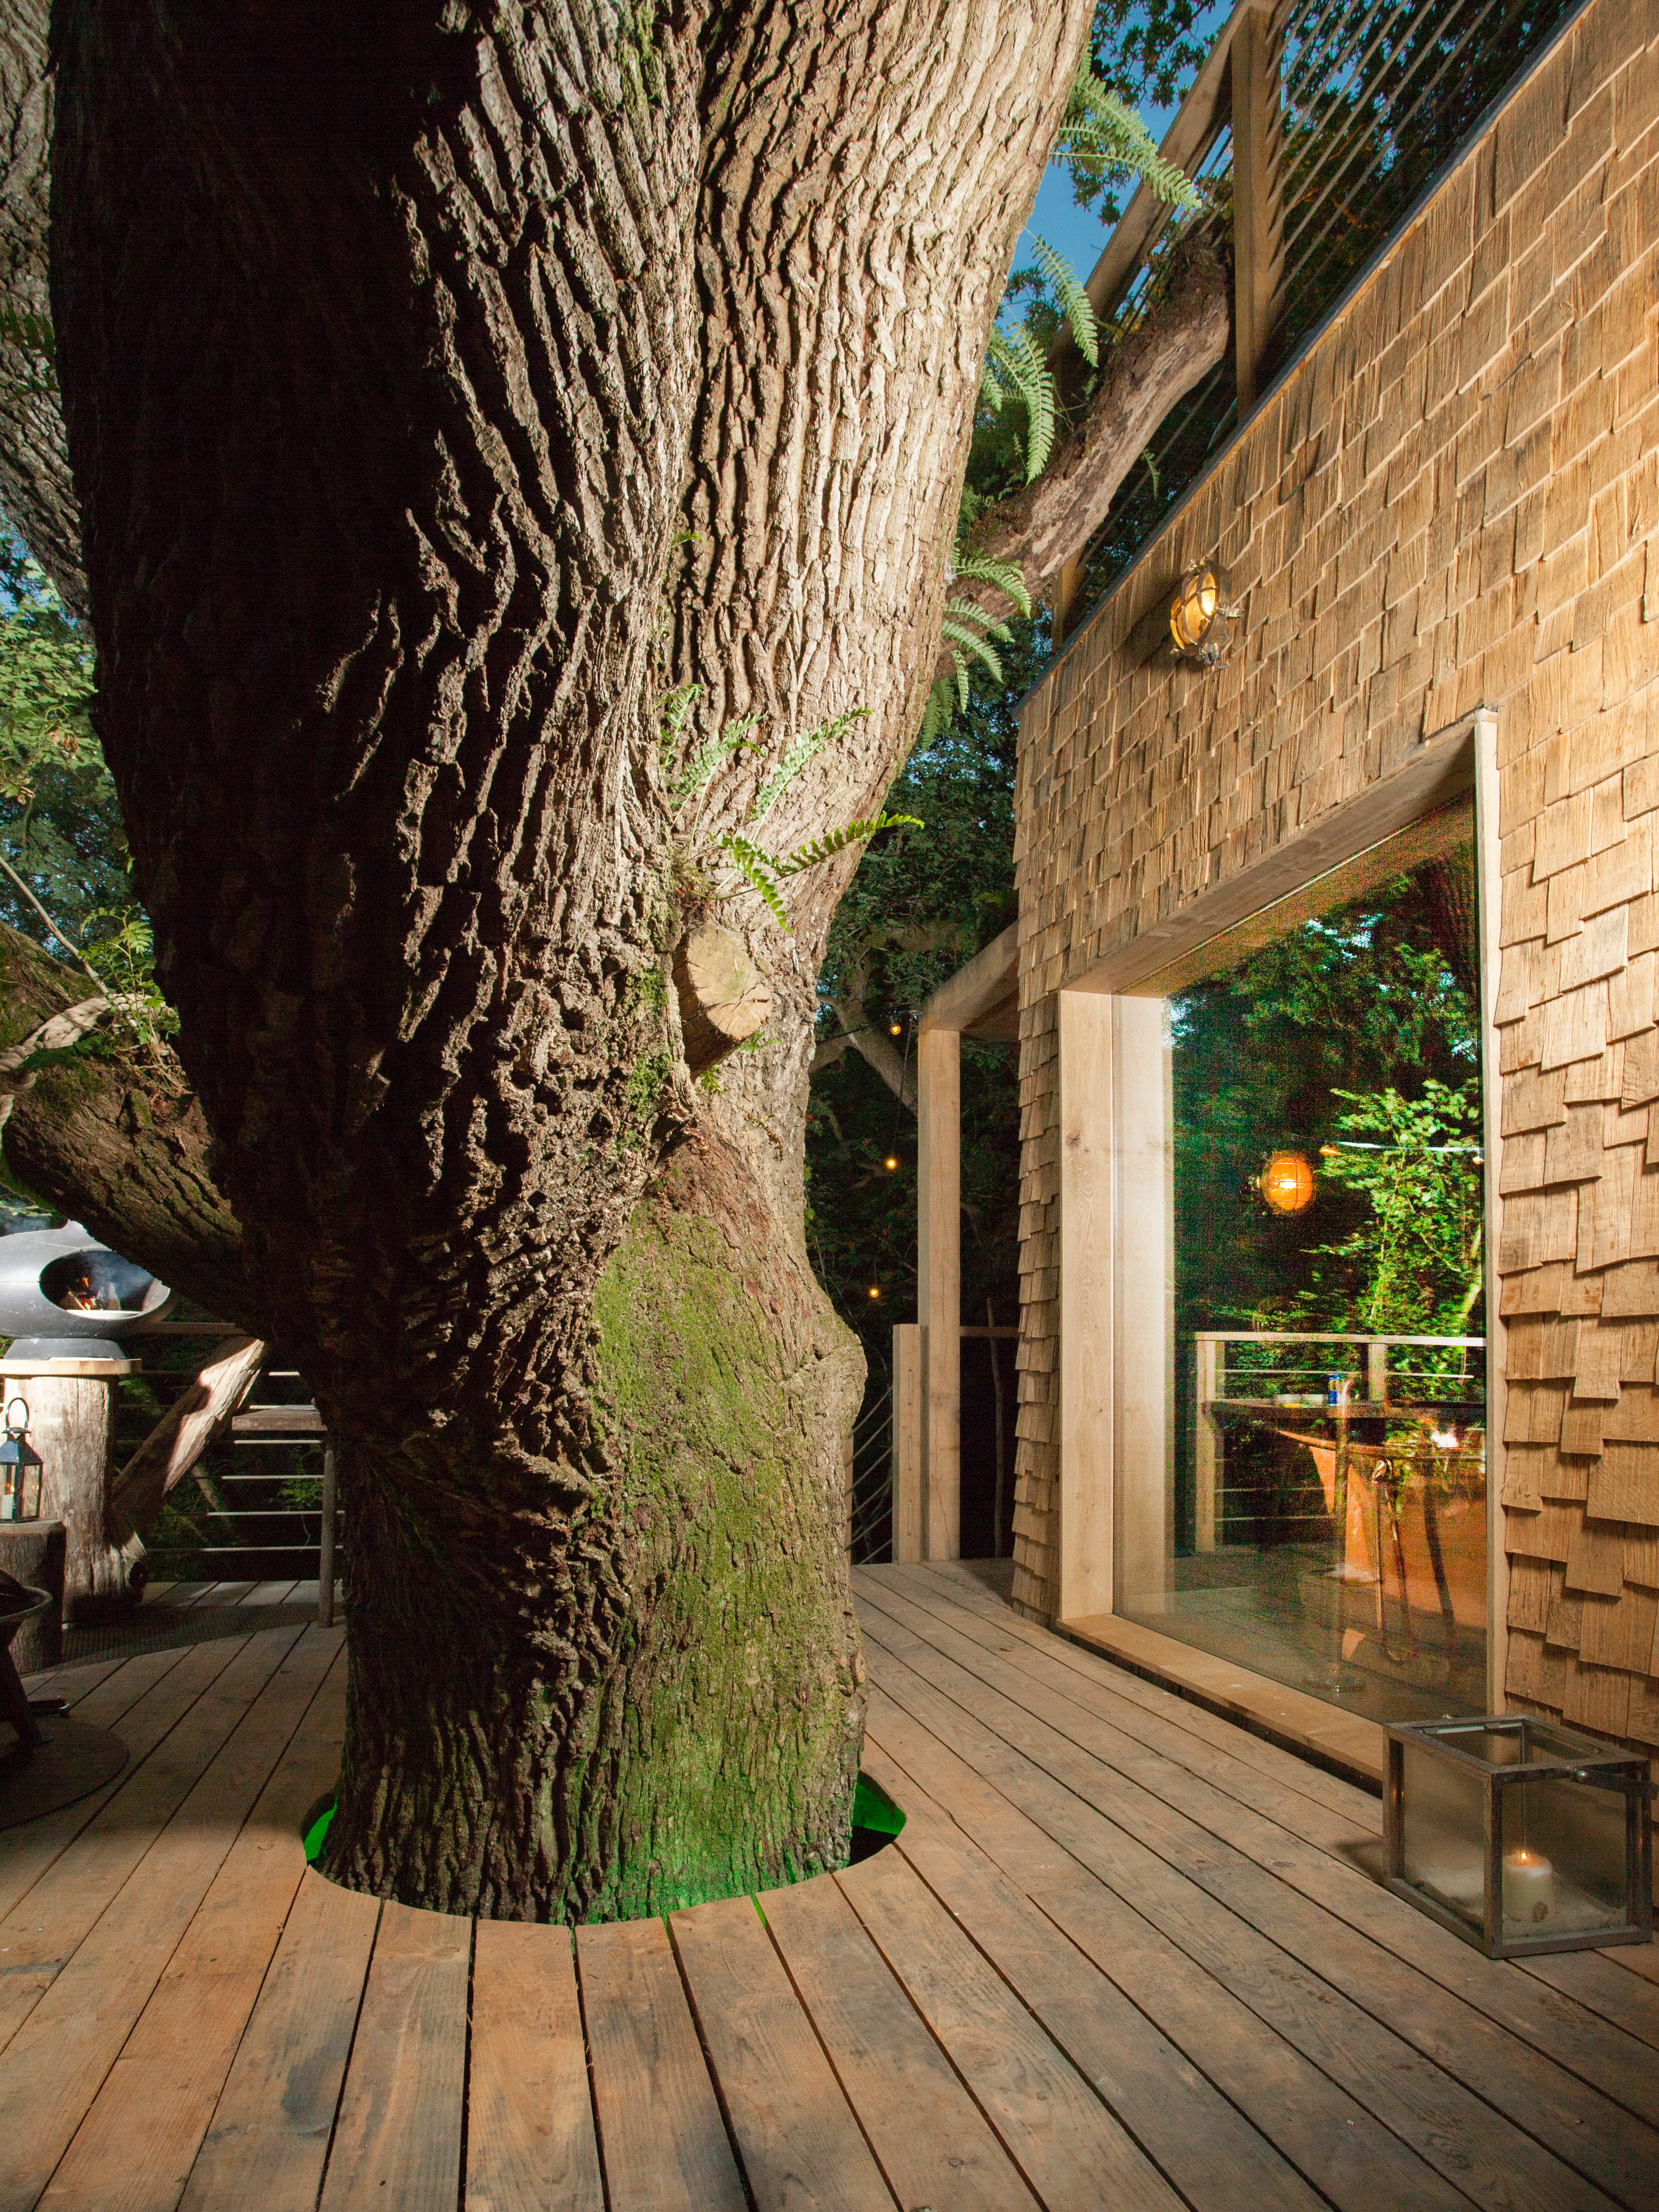 The Woodsman S Treehouse